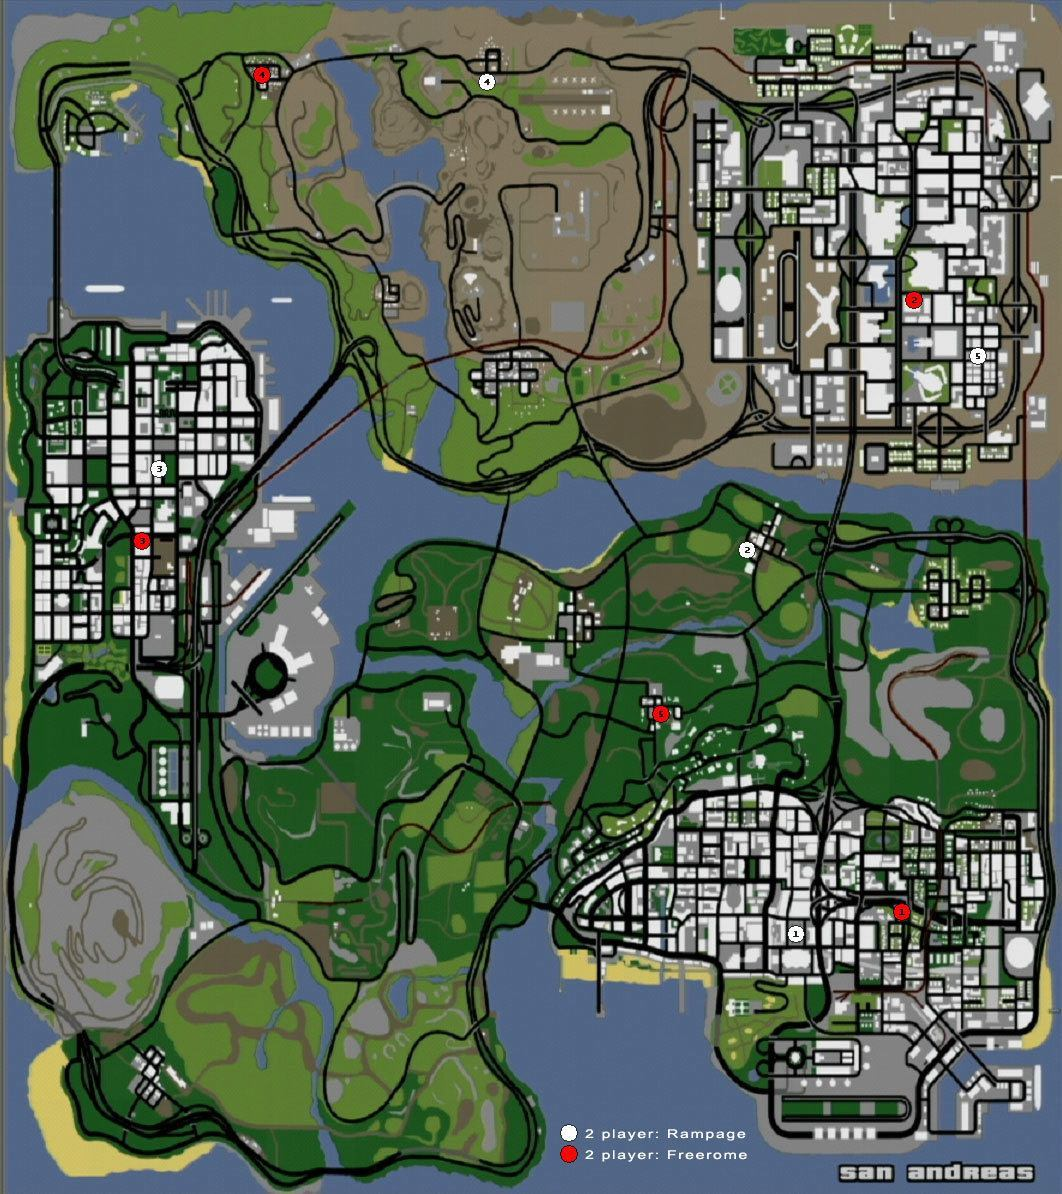 Grand Theft Auto: San Andreas (GTA) kort map